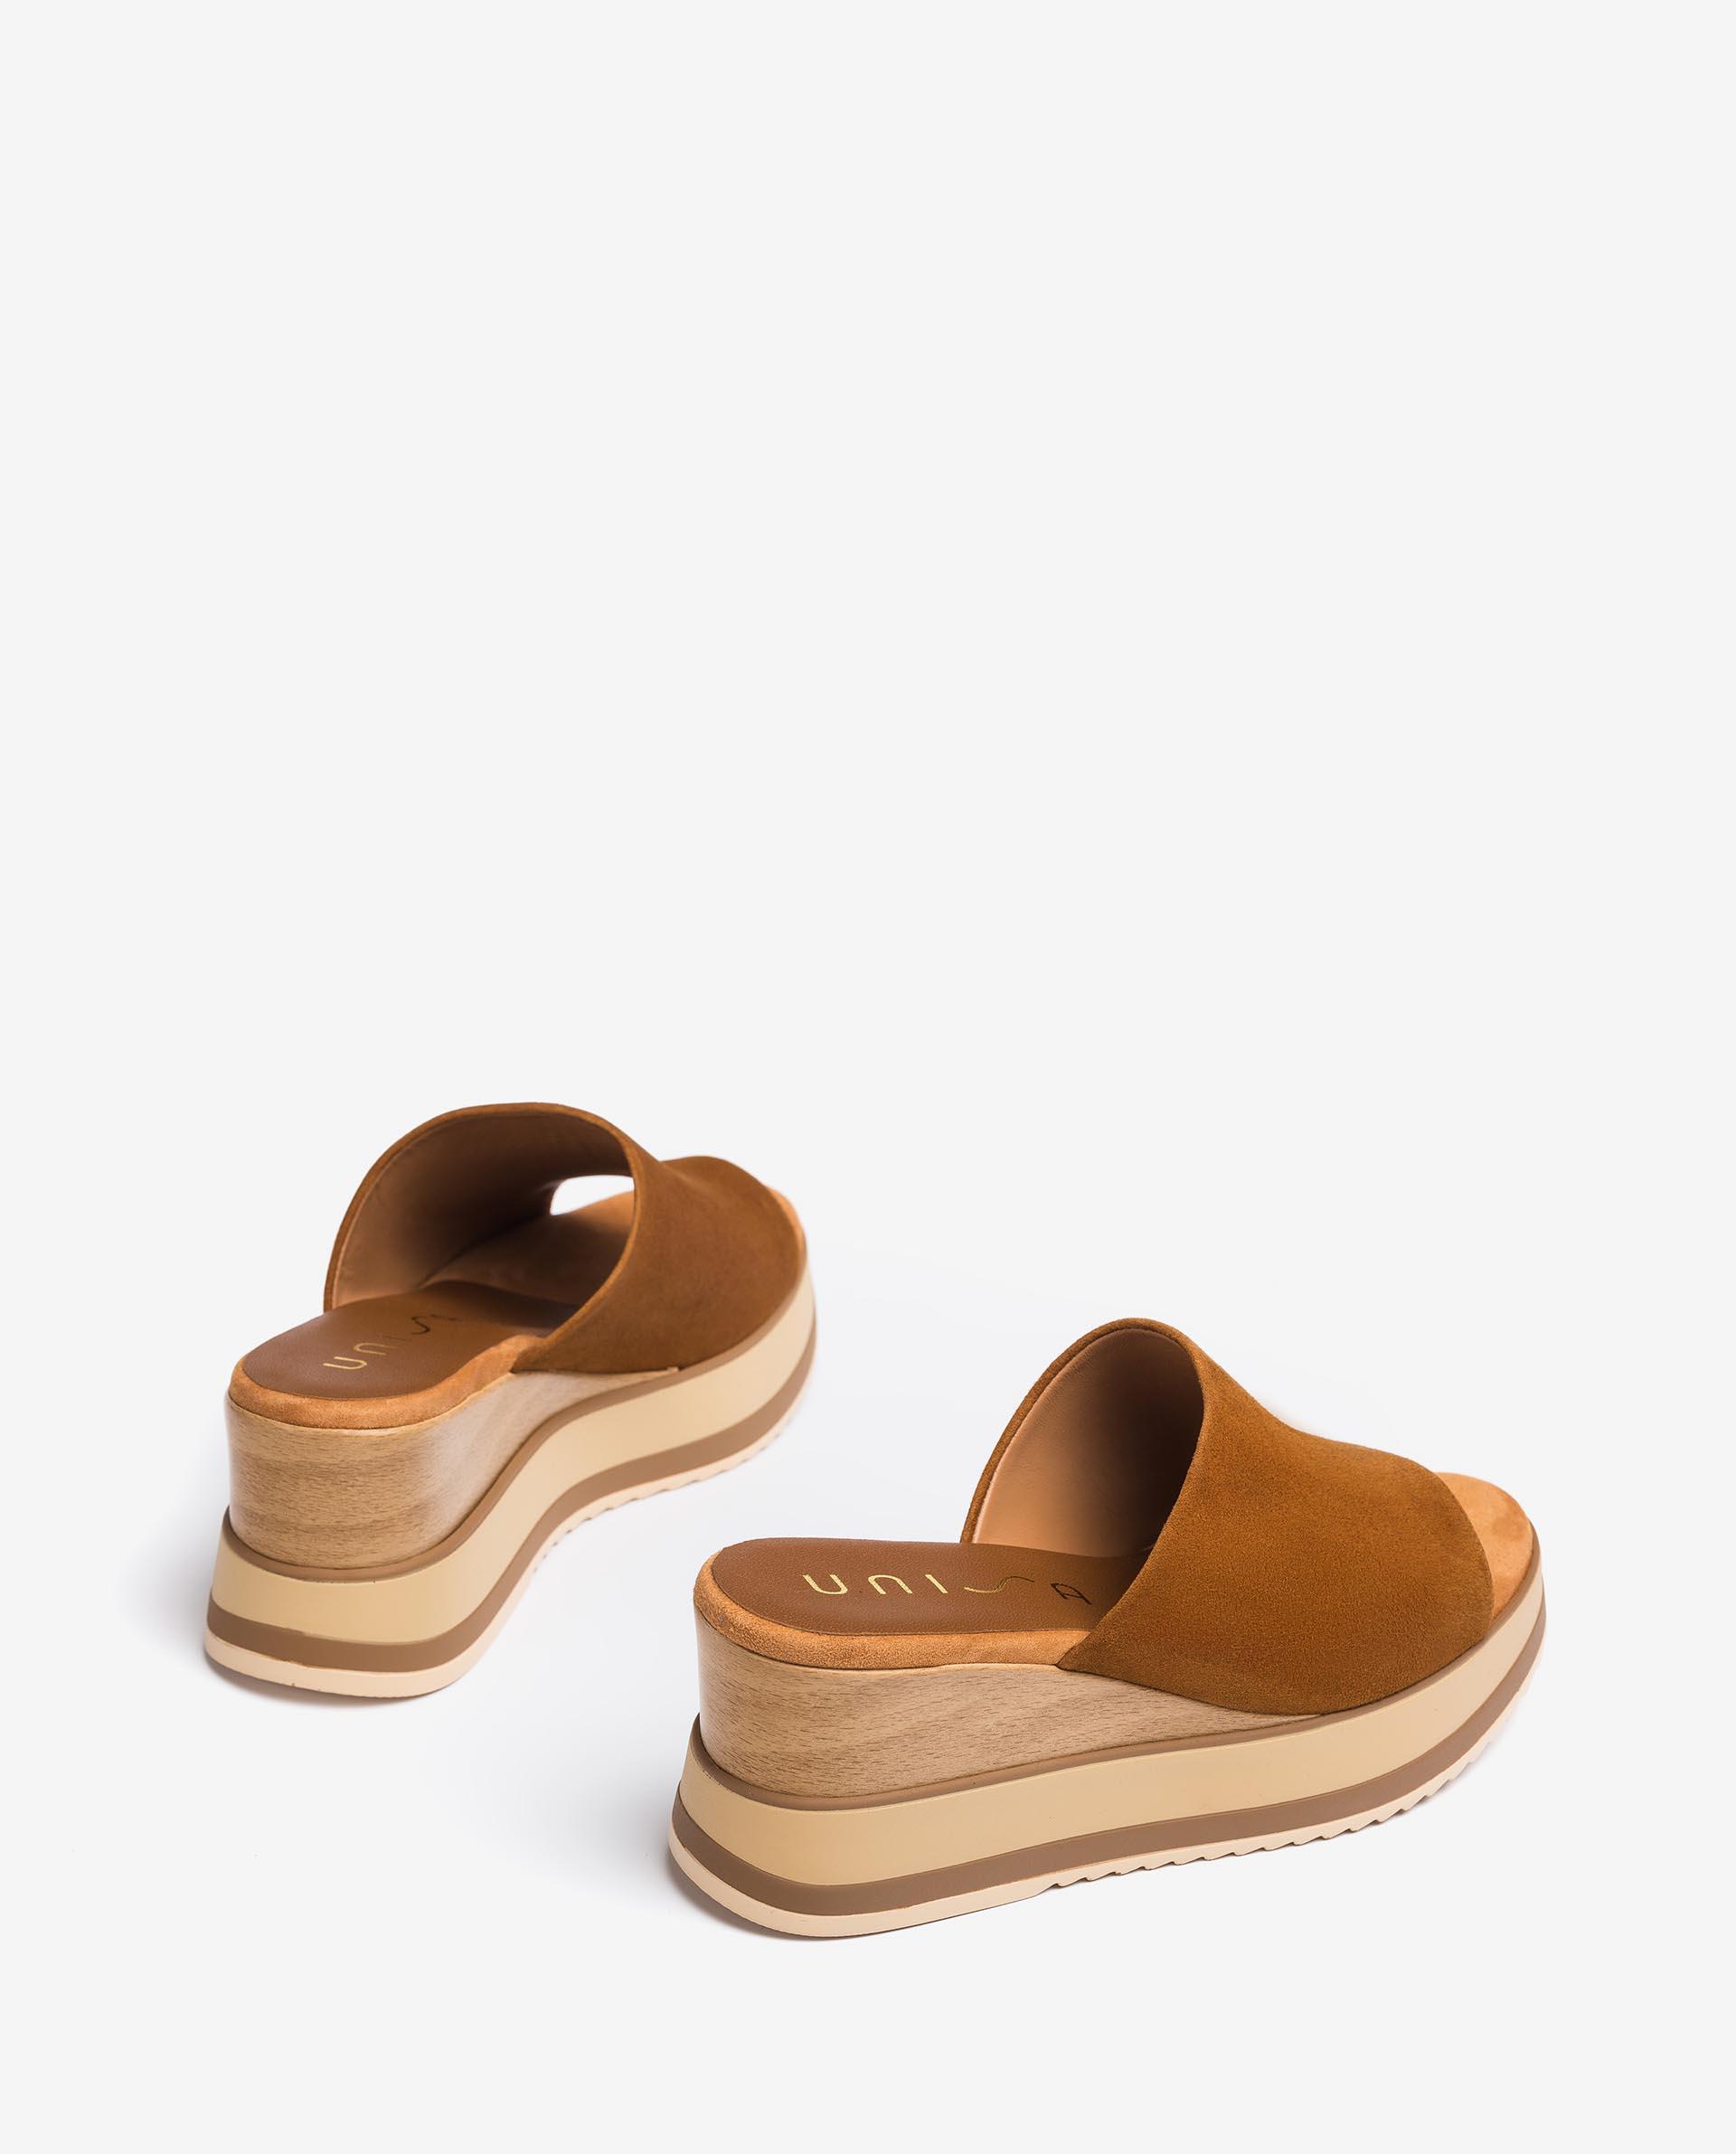 UNISA Wooden effect wedge sandals KALANI_KS 2